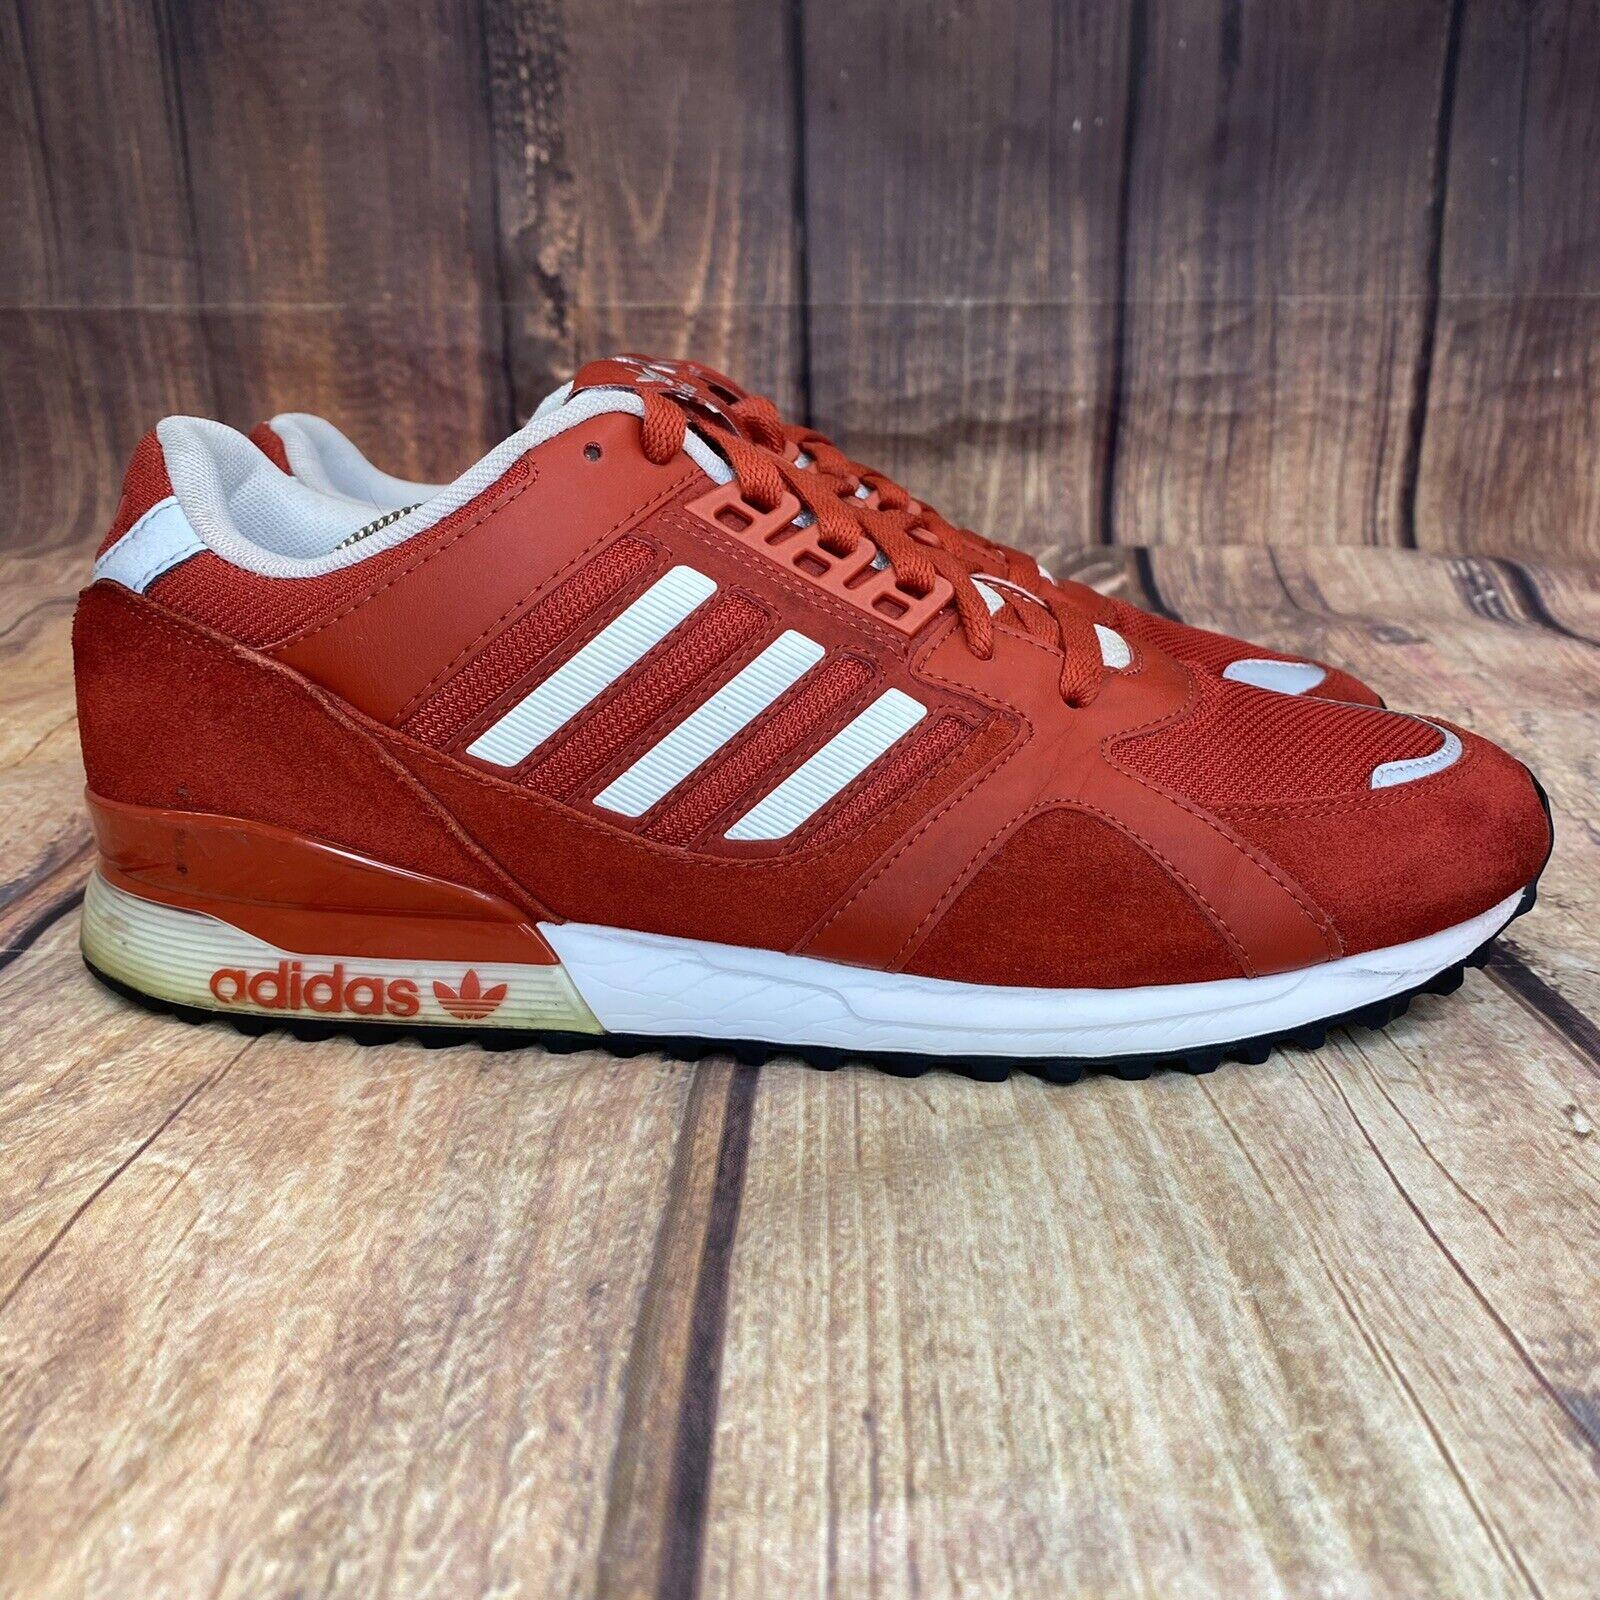 Adidas T-ZX 700 Trainers Men Size 11.5 Athletic Shoes… - Gem